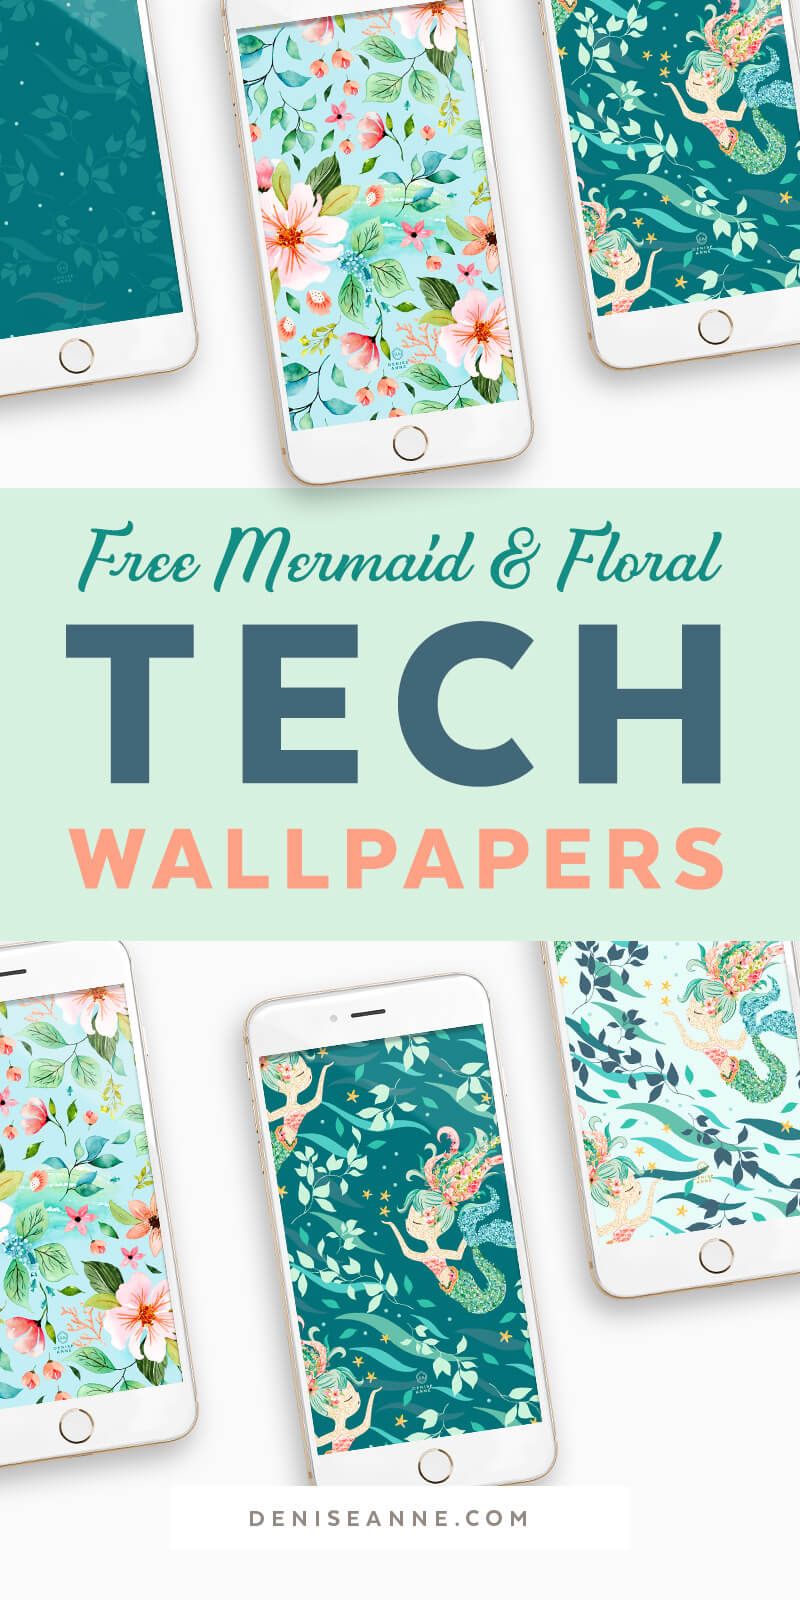 Free Mermaid Tropical Floral Watercolor Phone Wallpaper Mobile Phone 2877199 Hd Wallpaper Backgrounds Download